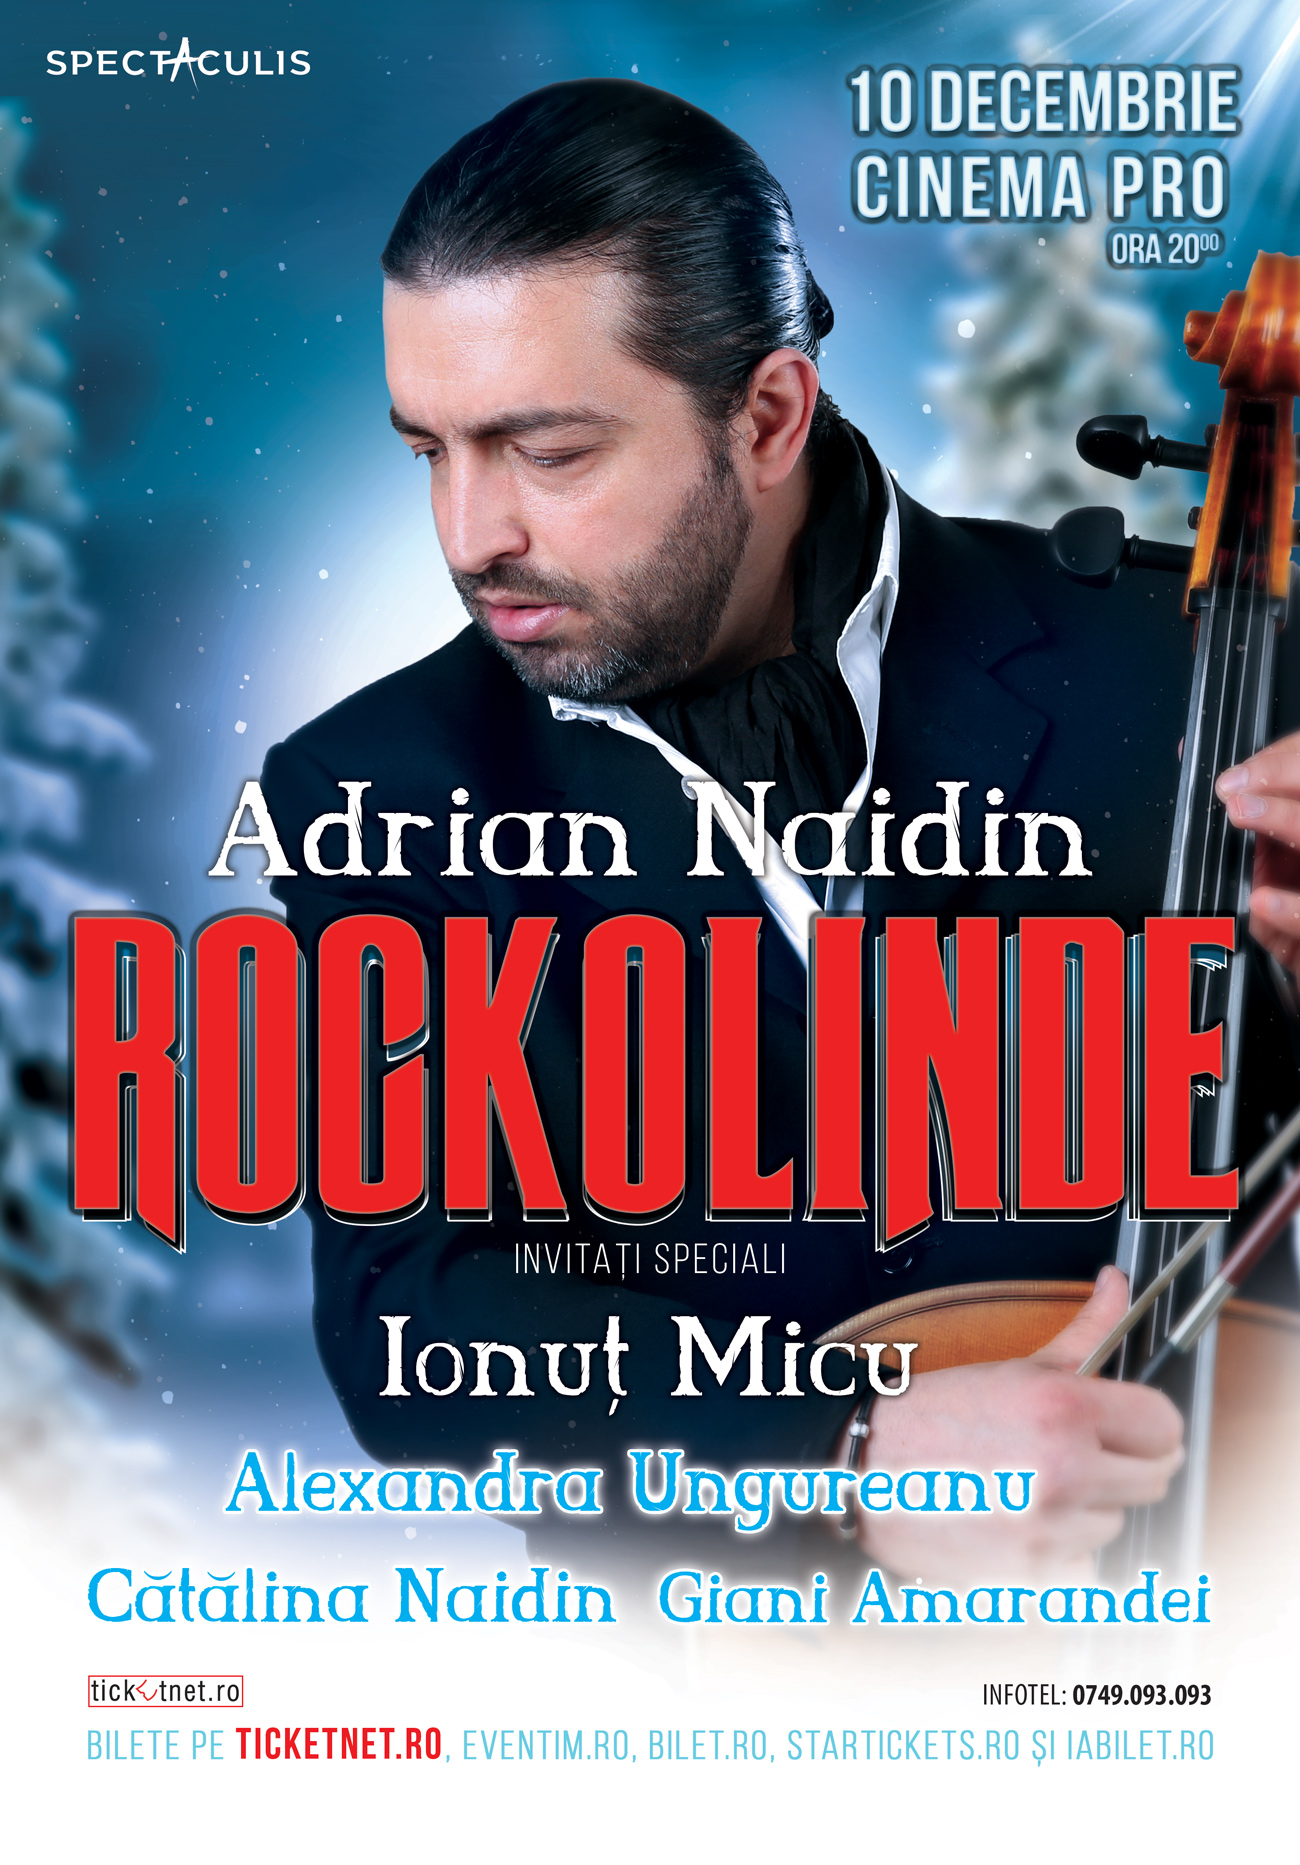 Adrian Naidin - ROCKOLINDE